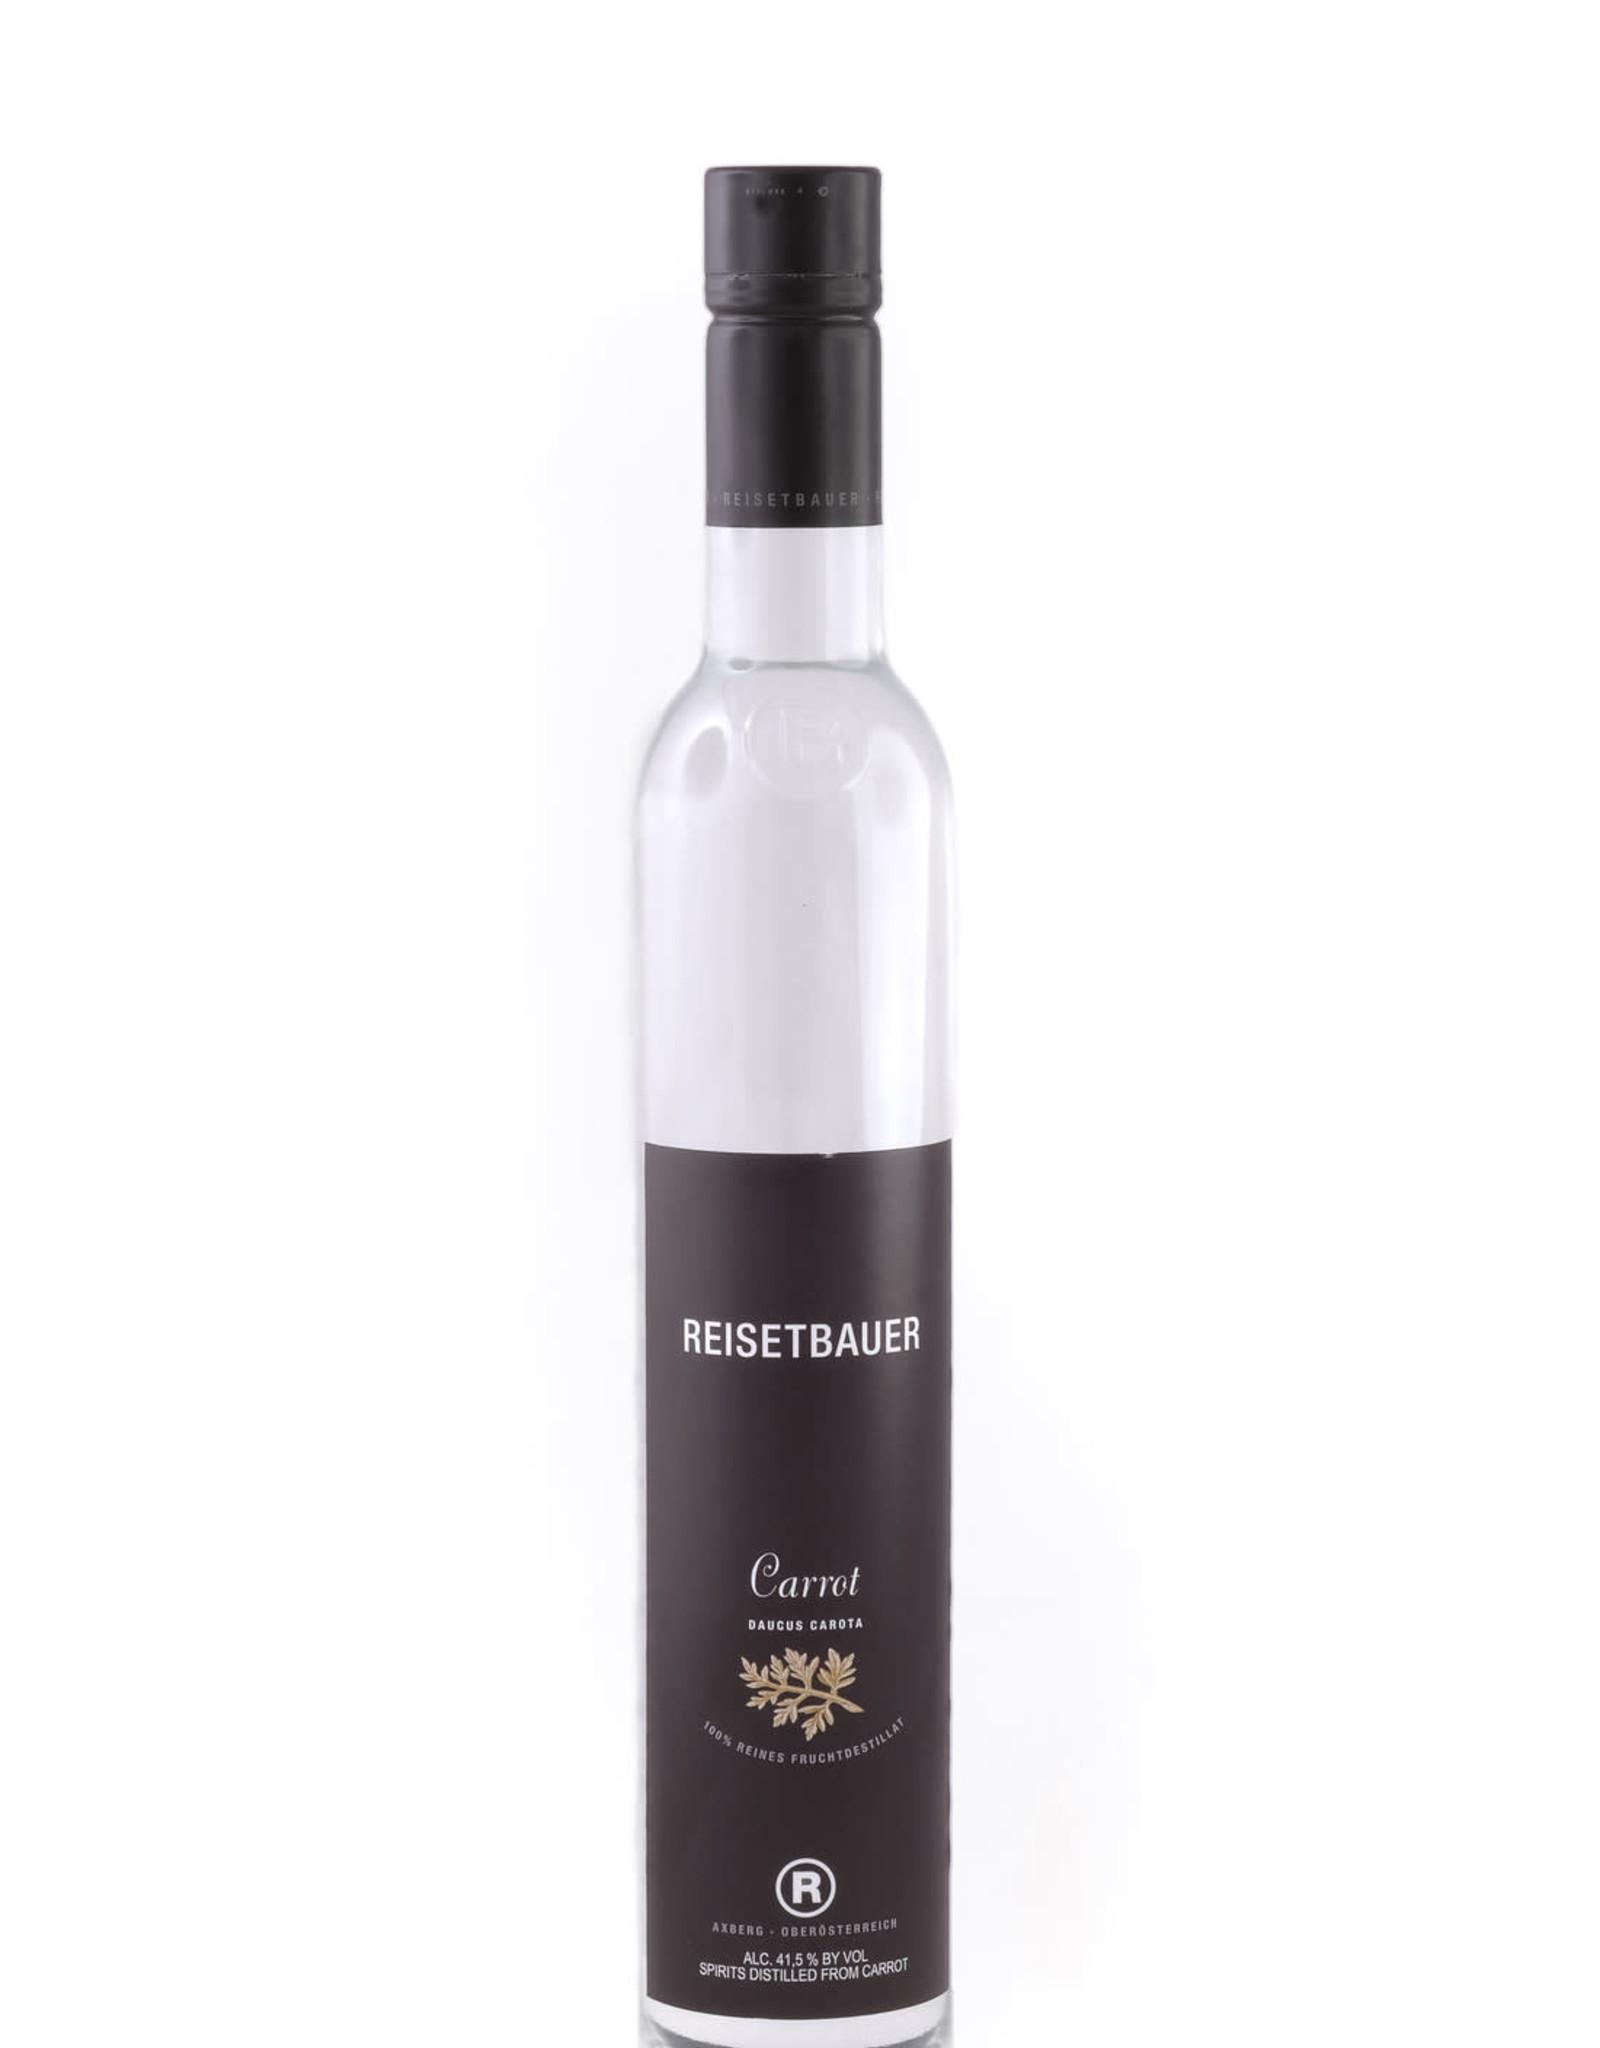 Spirits Carrot, Eau de Vie, Reisetbauer (375 ml)